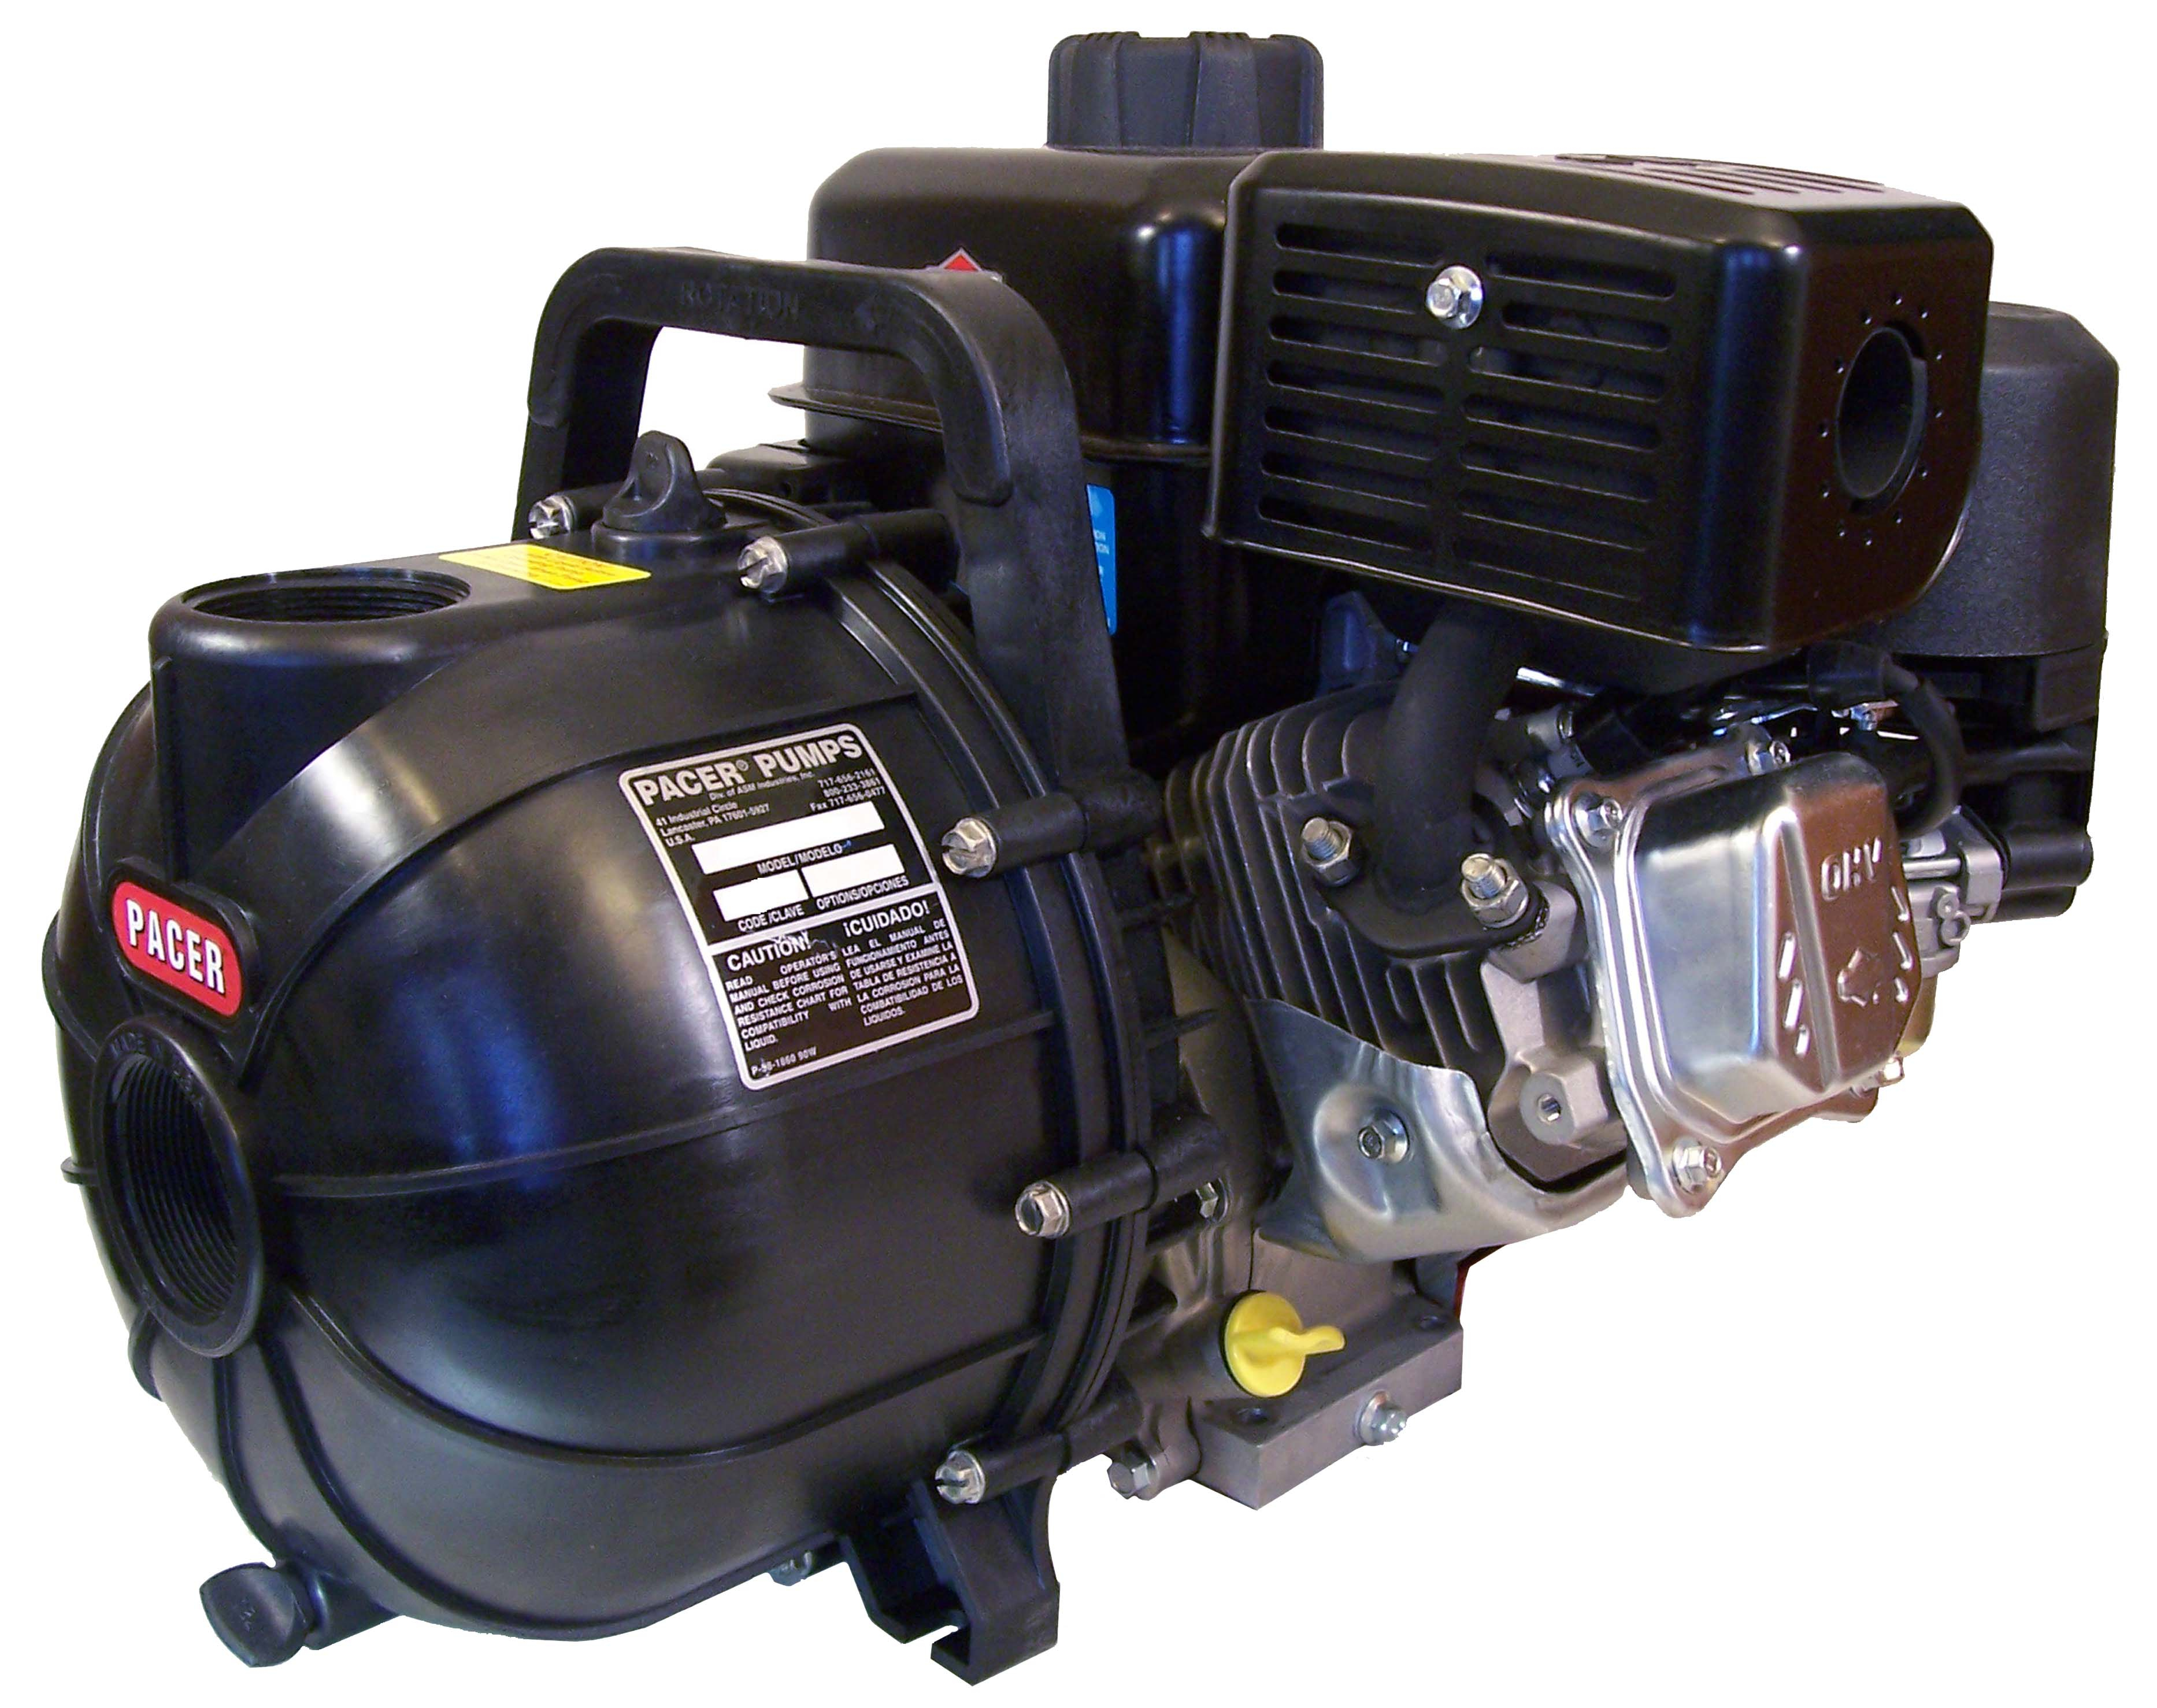 Pacer Self Priming Centrifugal Gasoline Briggs Stratton Water Diagram And Ohv Engine Parts Diagrams Pump Se2ul E950 2 200 Gpm Female Npt